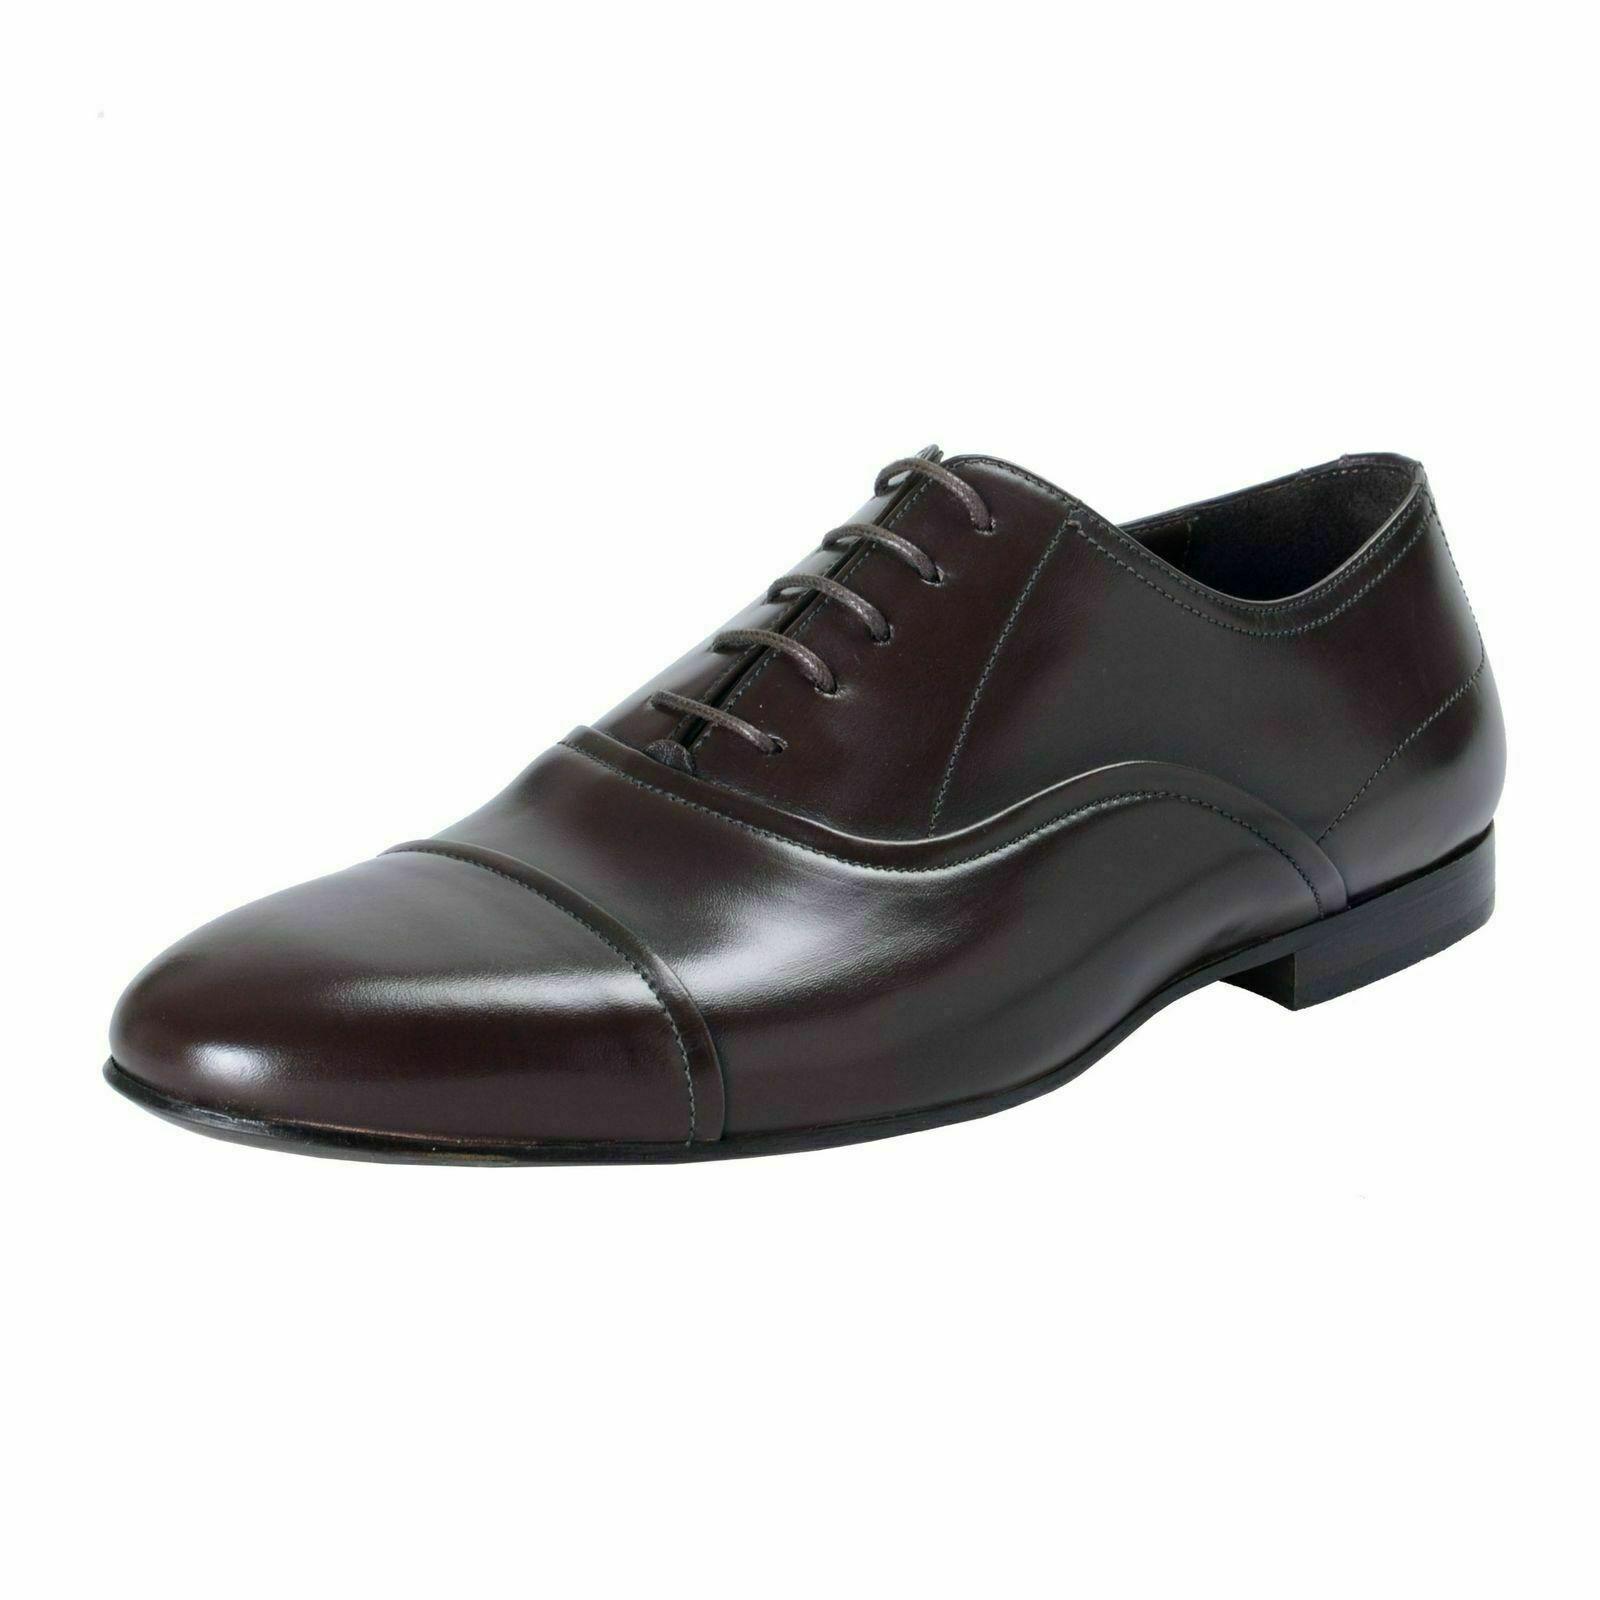 A.Testoni Basic Herren Leder Dunkelbraun Schnürschuhe Oxford Schuhe US 9 It 42